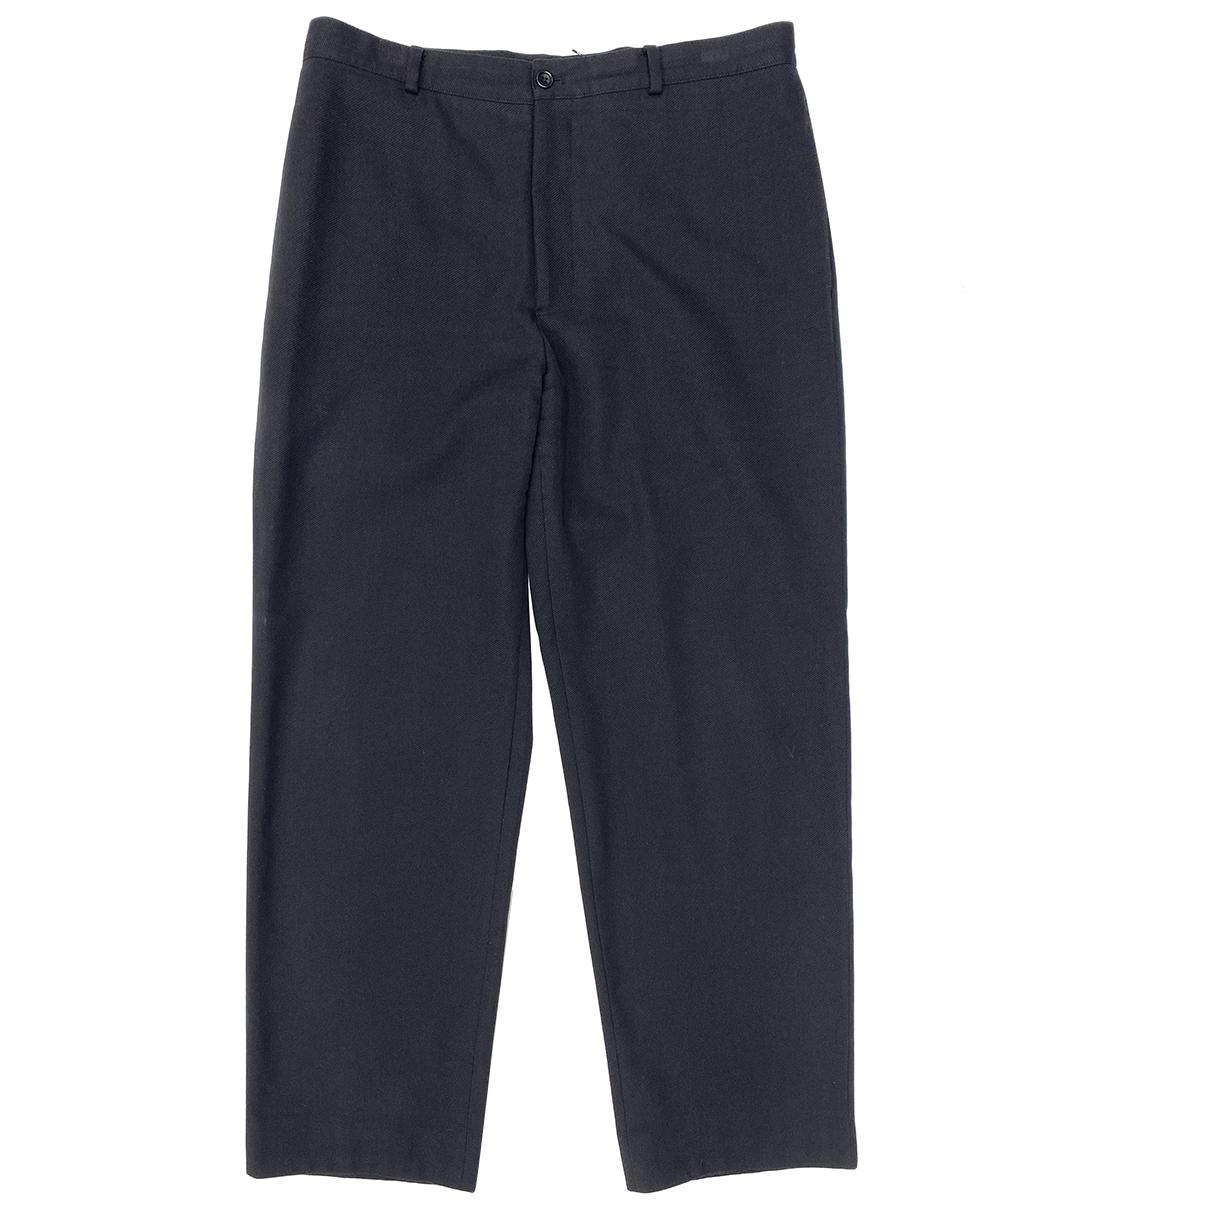 Pantalones en Algodon Negro Armani Collezioni